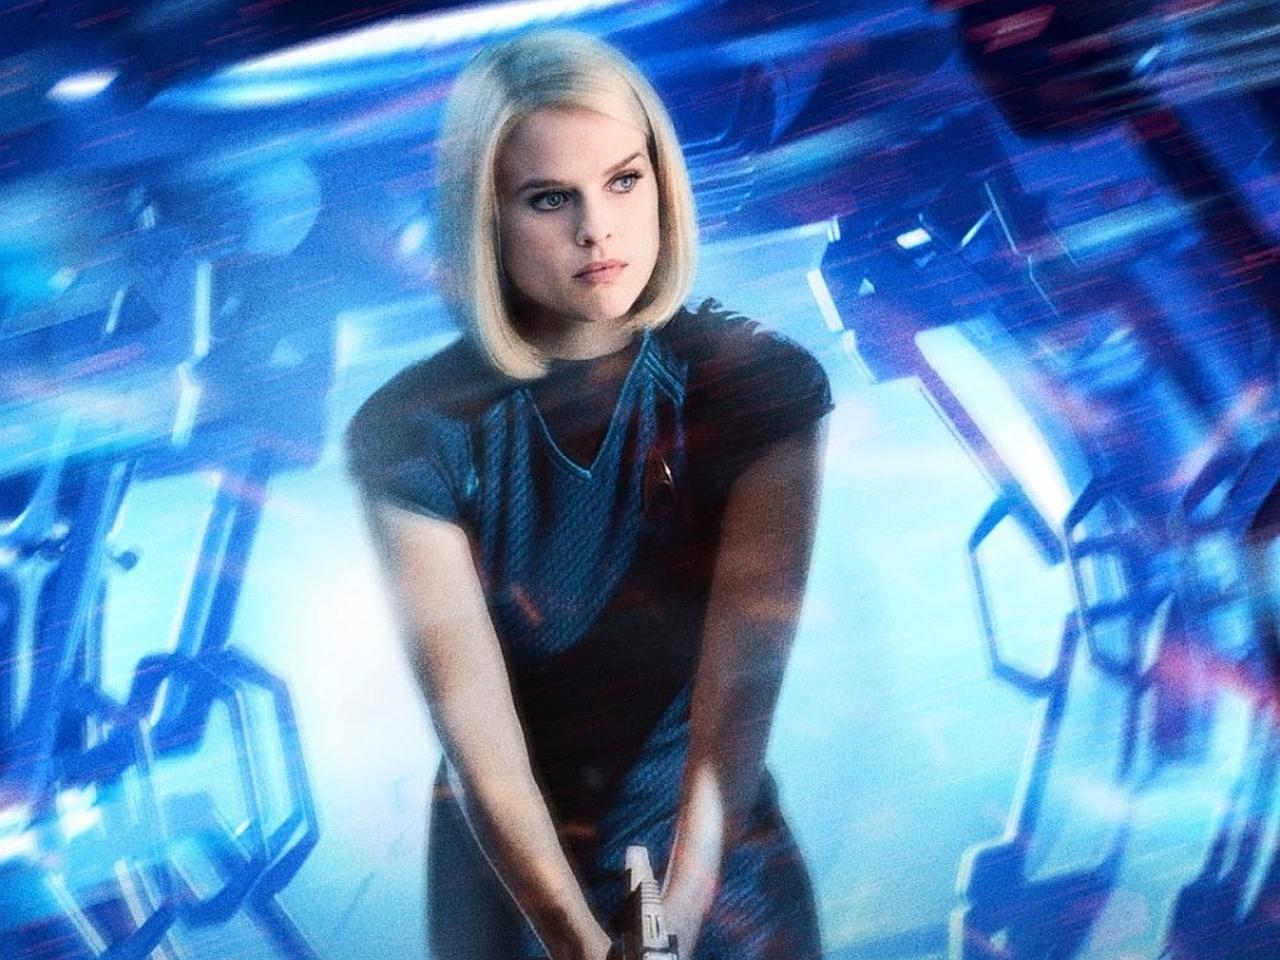 Star Trek Into Darkness wallpaper 1280x960 017